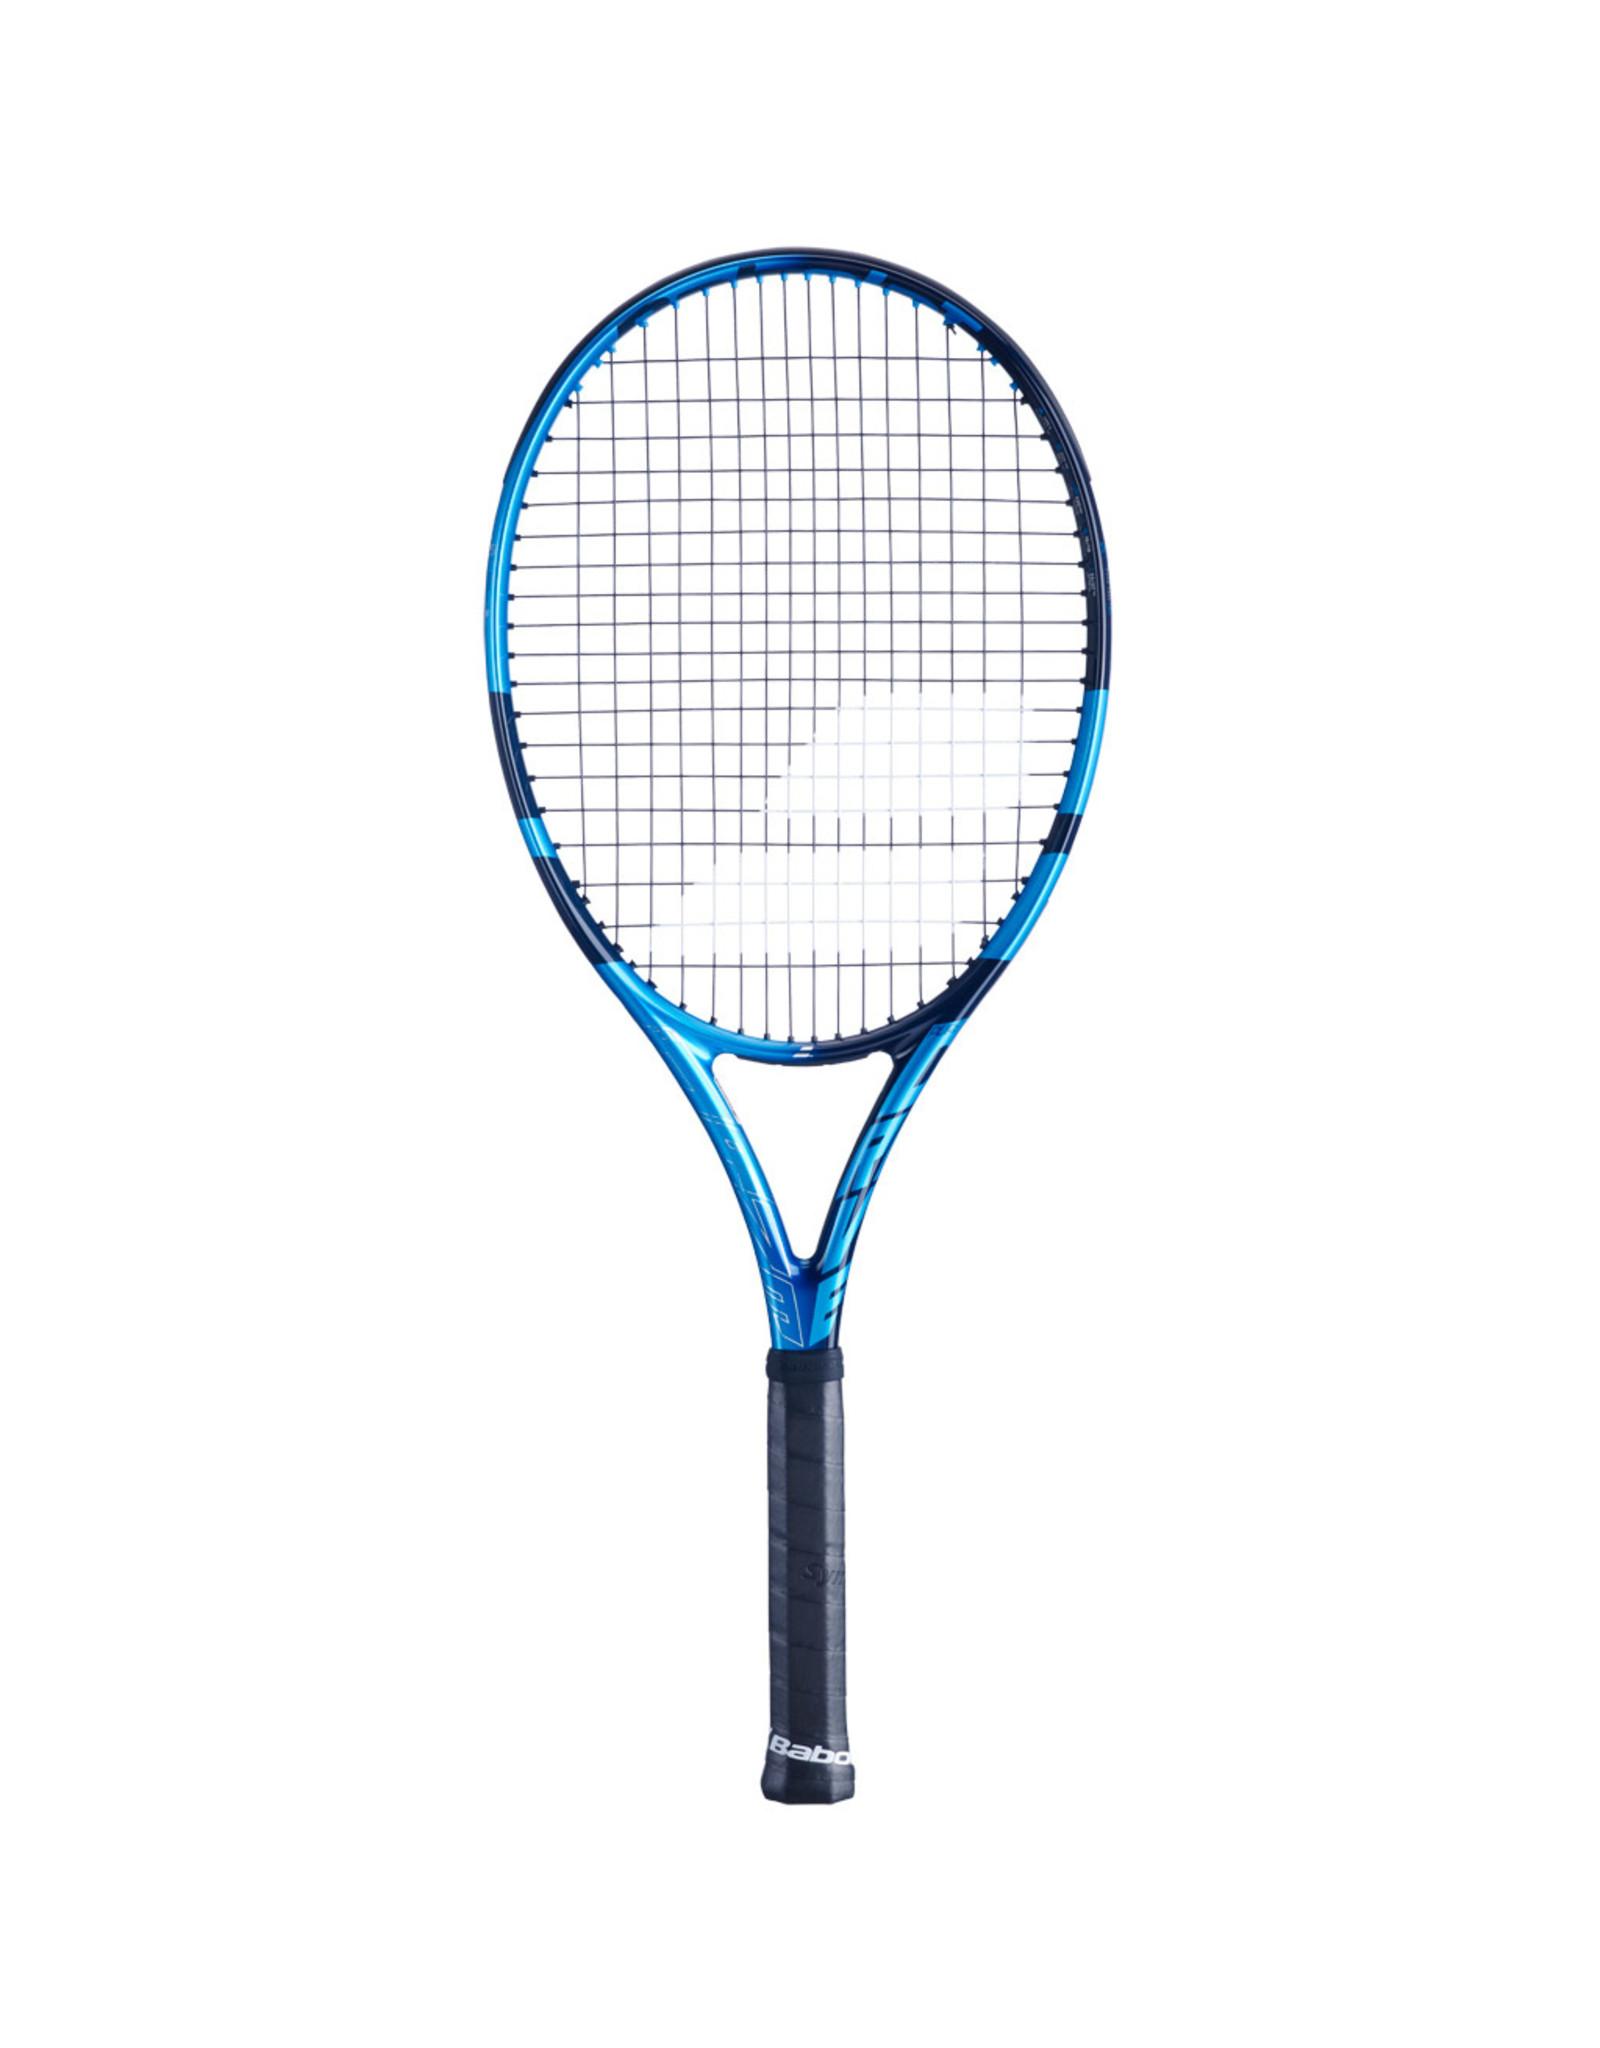 Babolat Babolat Pure Drive 2021 110 Tennis Racquet